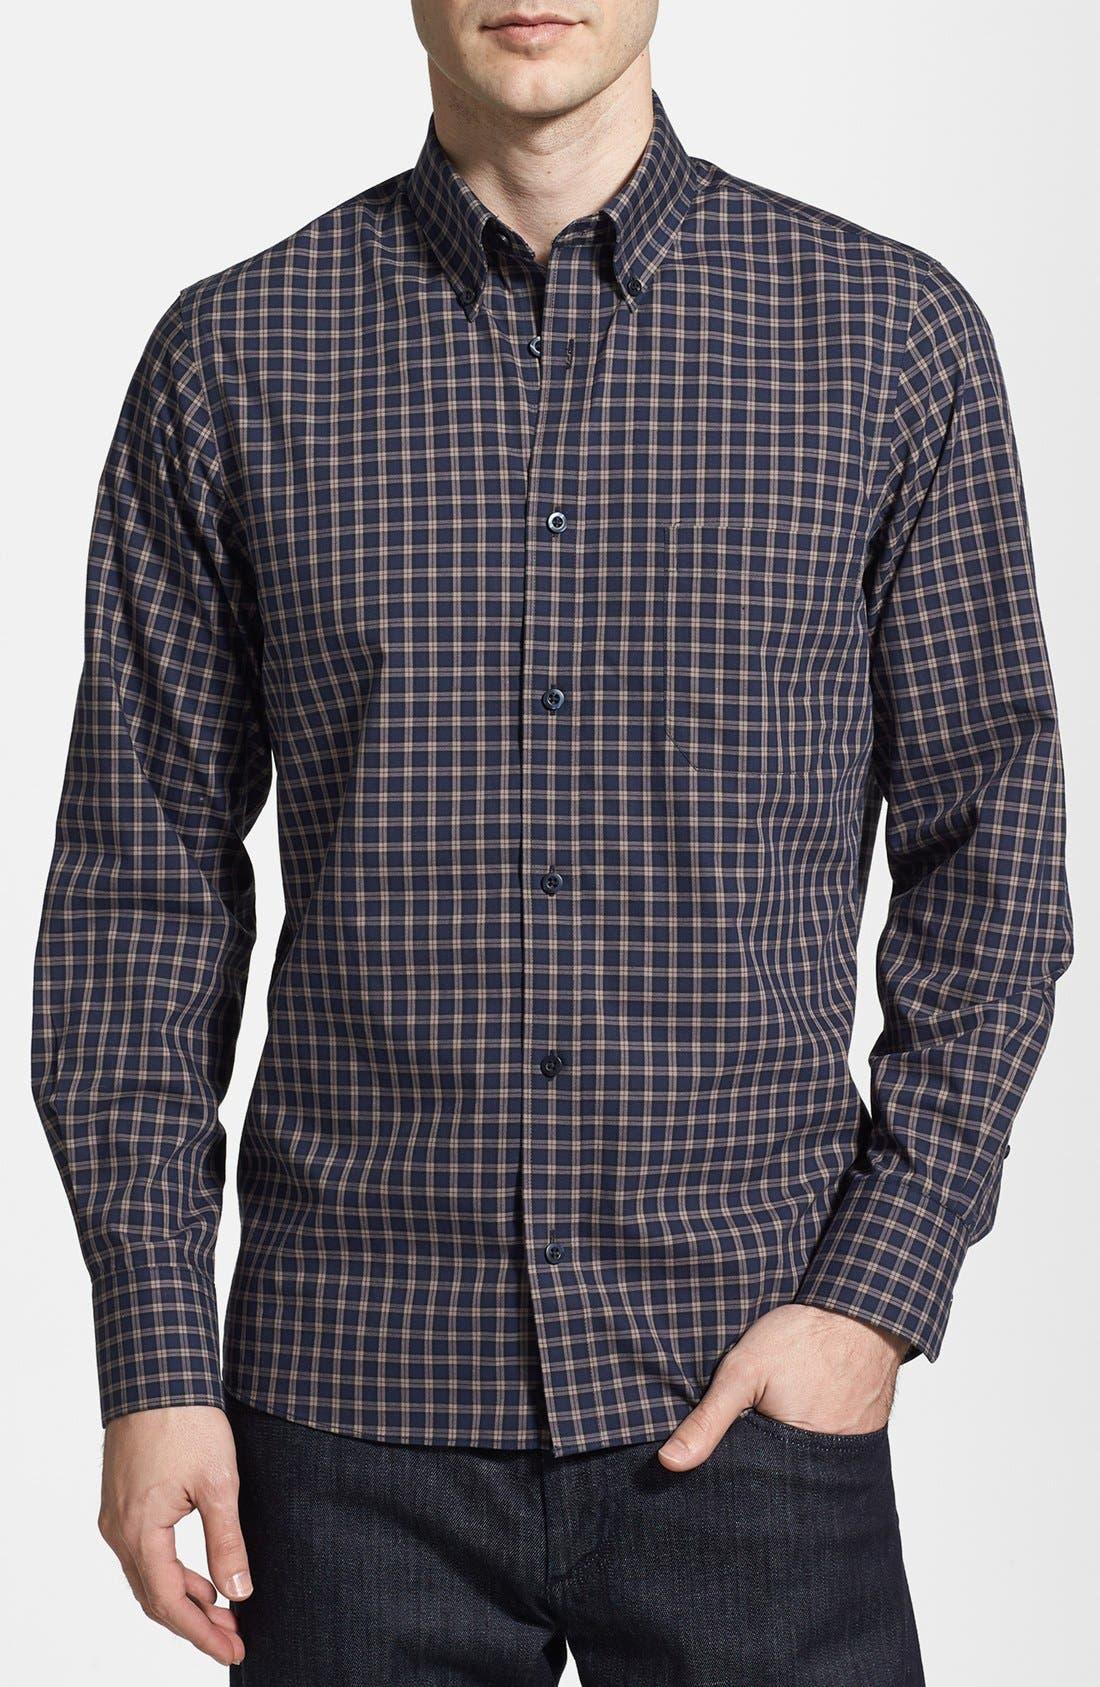 Alternate Image 1 Selected - Nordstrom Smartcare™ Trim Fit Plaid Sport Shirt